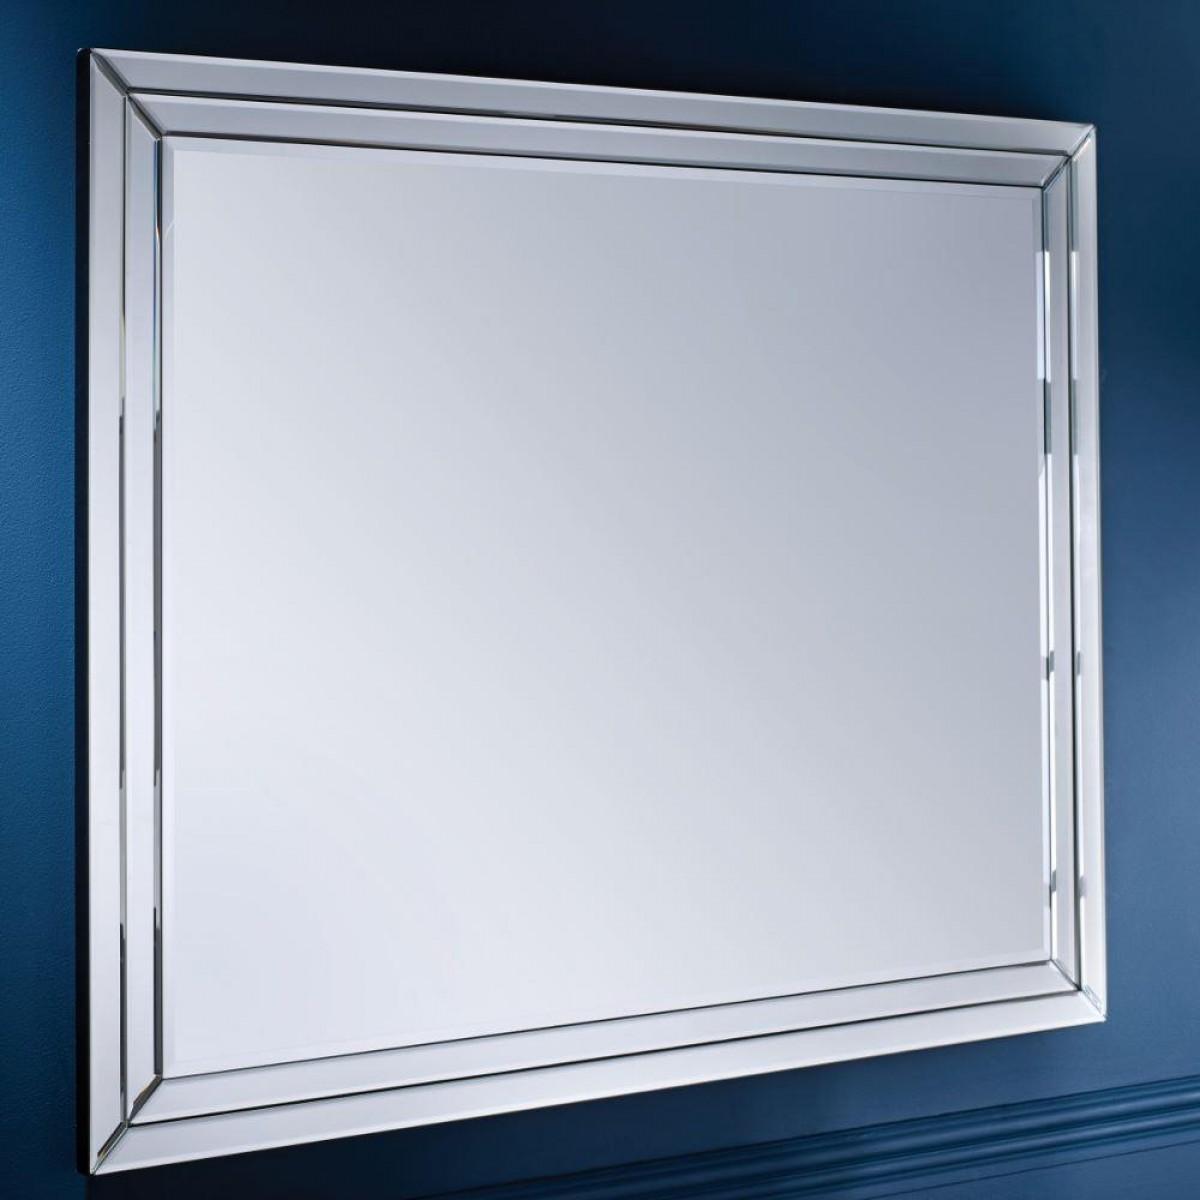 Valencia Mirrored Wall Mirror